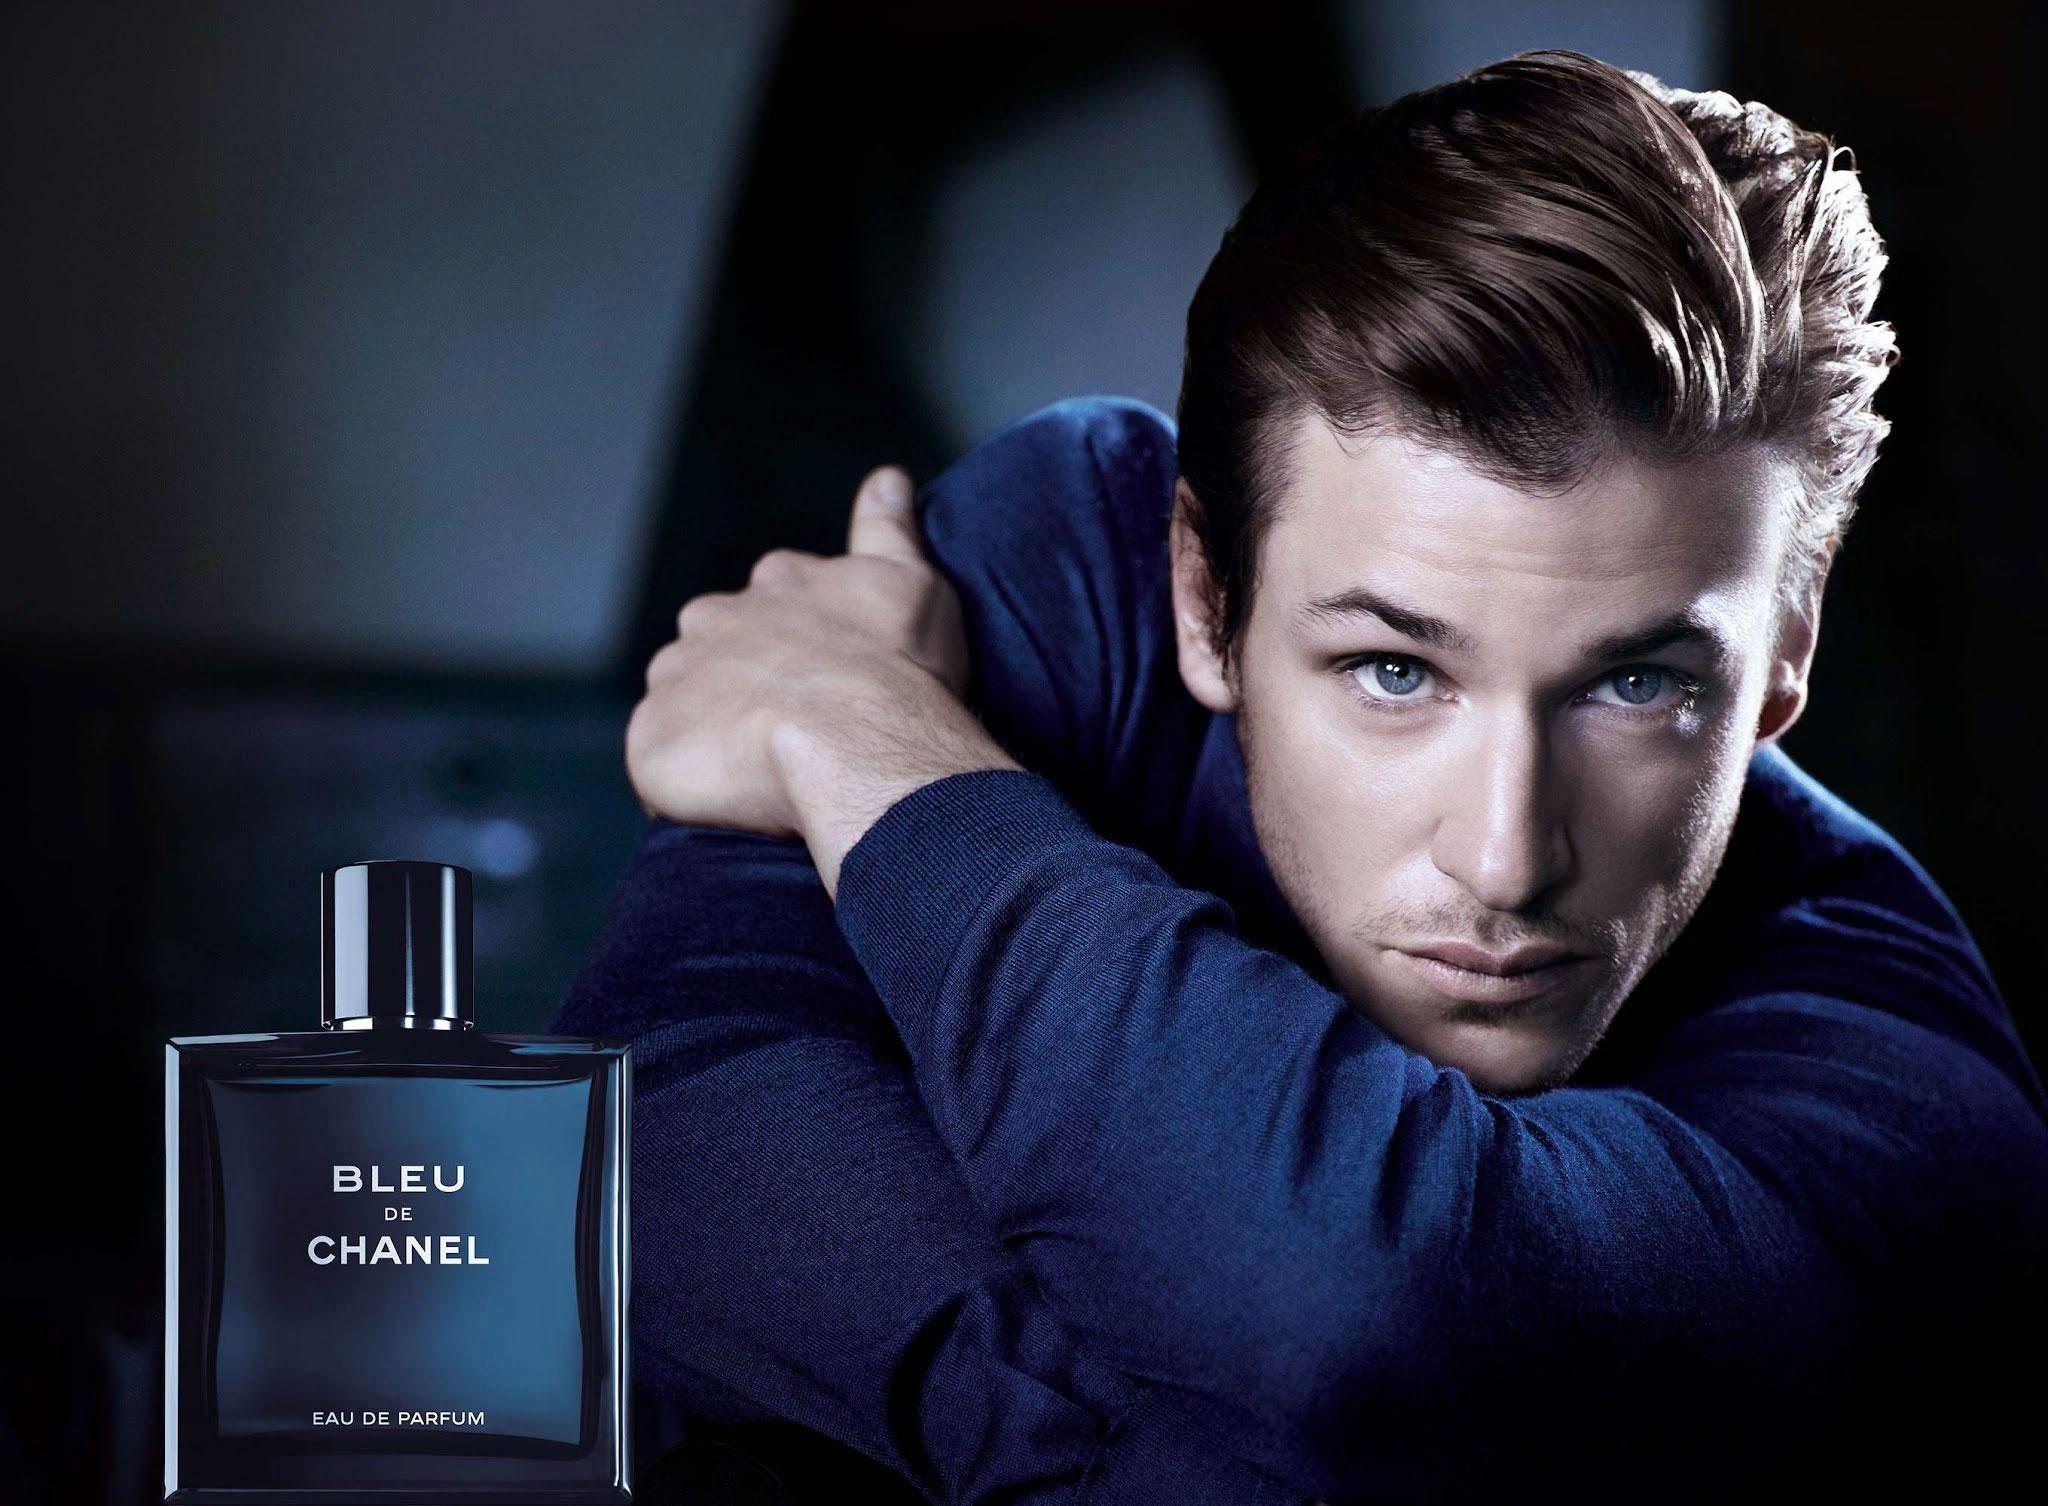 Bleu De Chanel Fragrances Perfumes Colognes Parfums